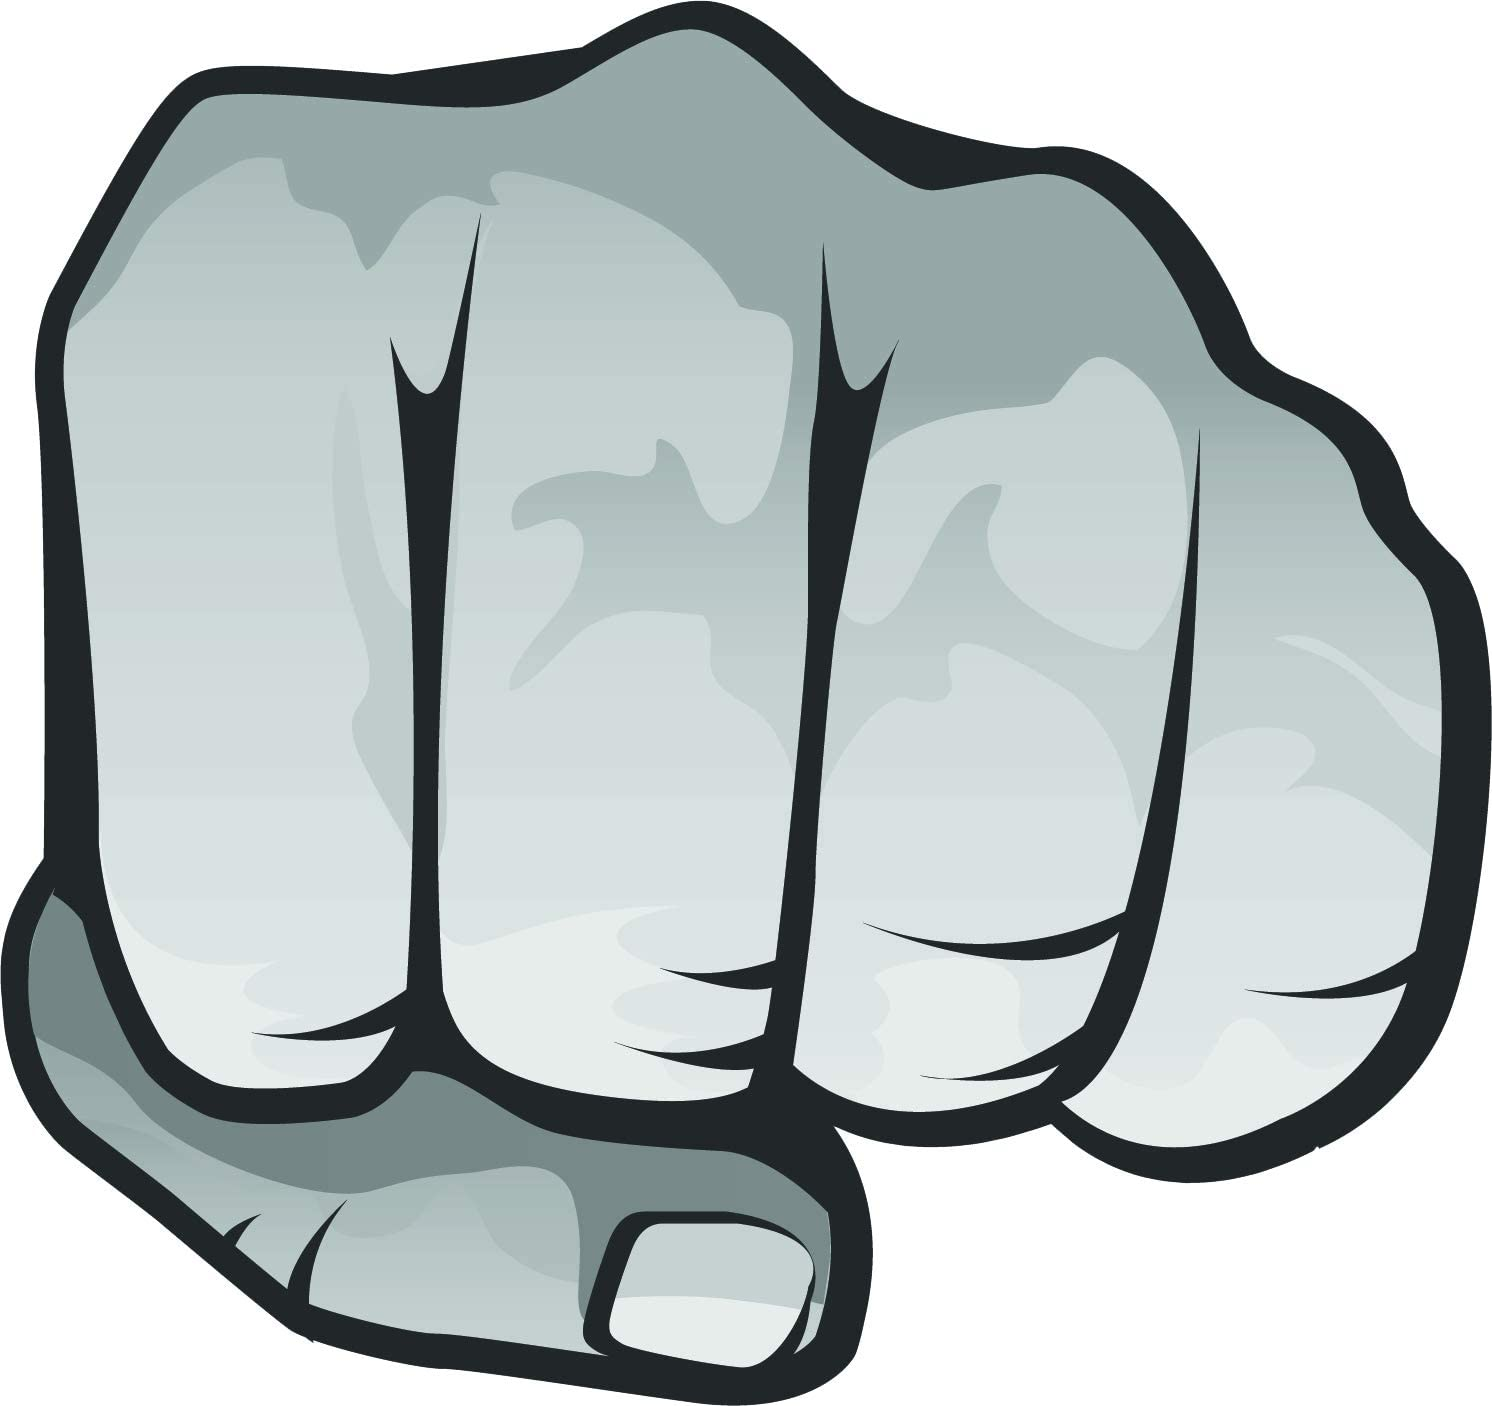 Amazon Com Simple Punch Fist Pound Cartoon Hand Emoji Vinyl Sticker Black And White Left Fist Automotive